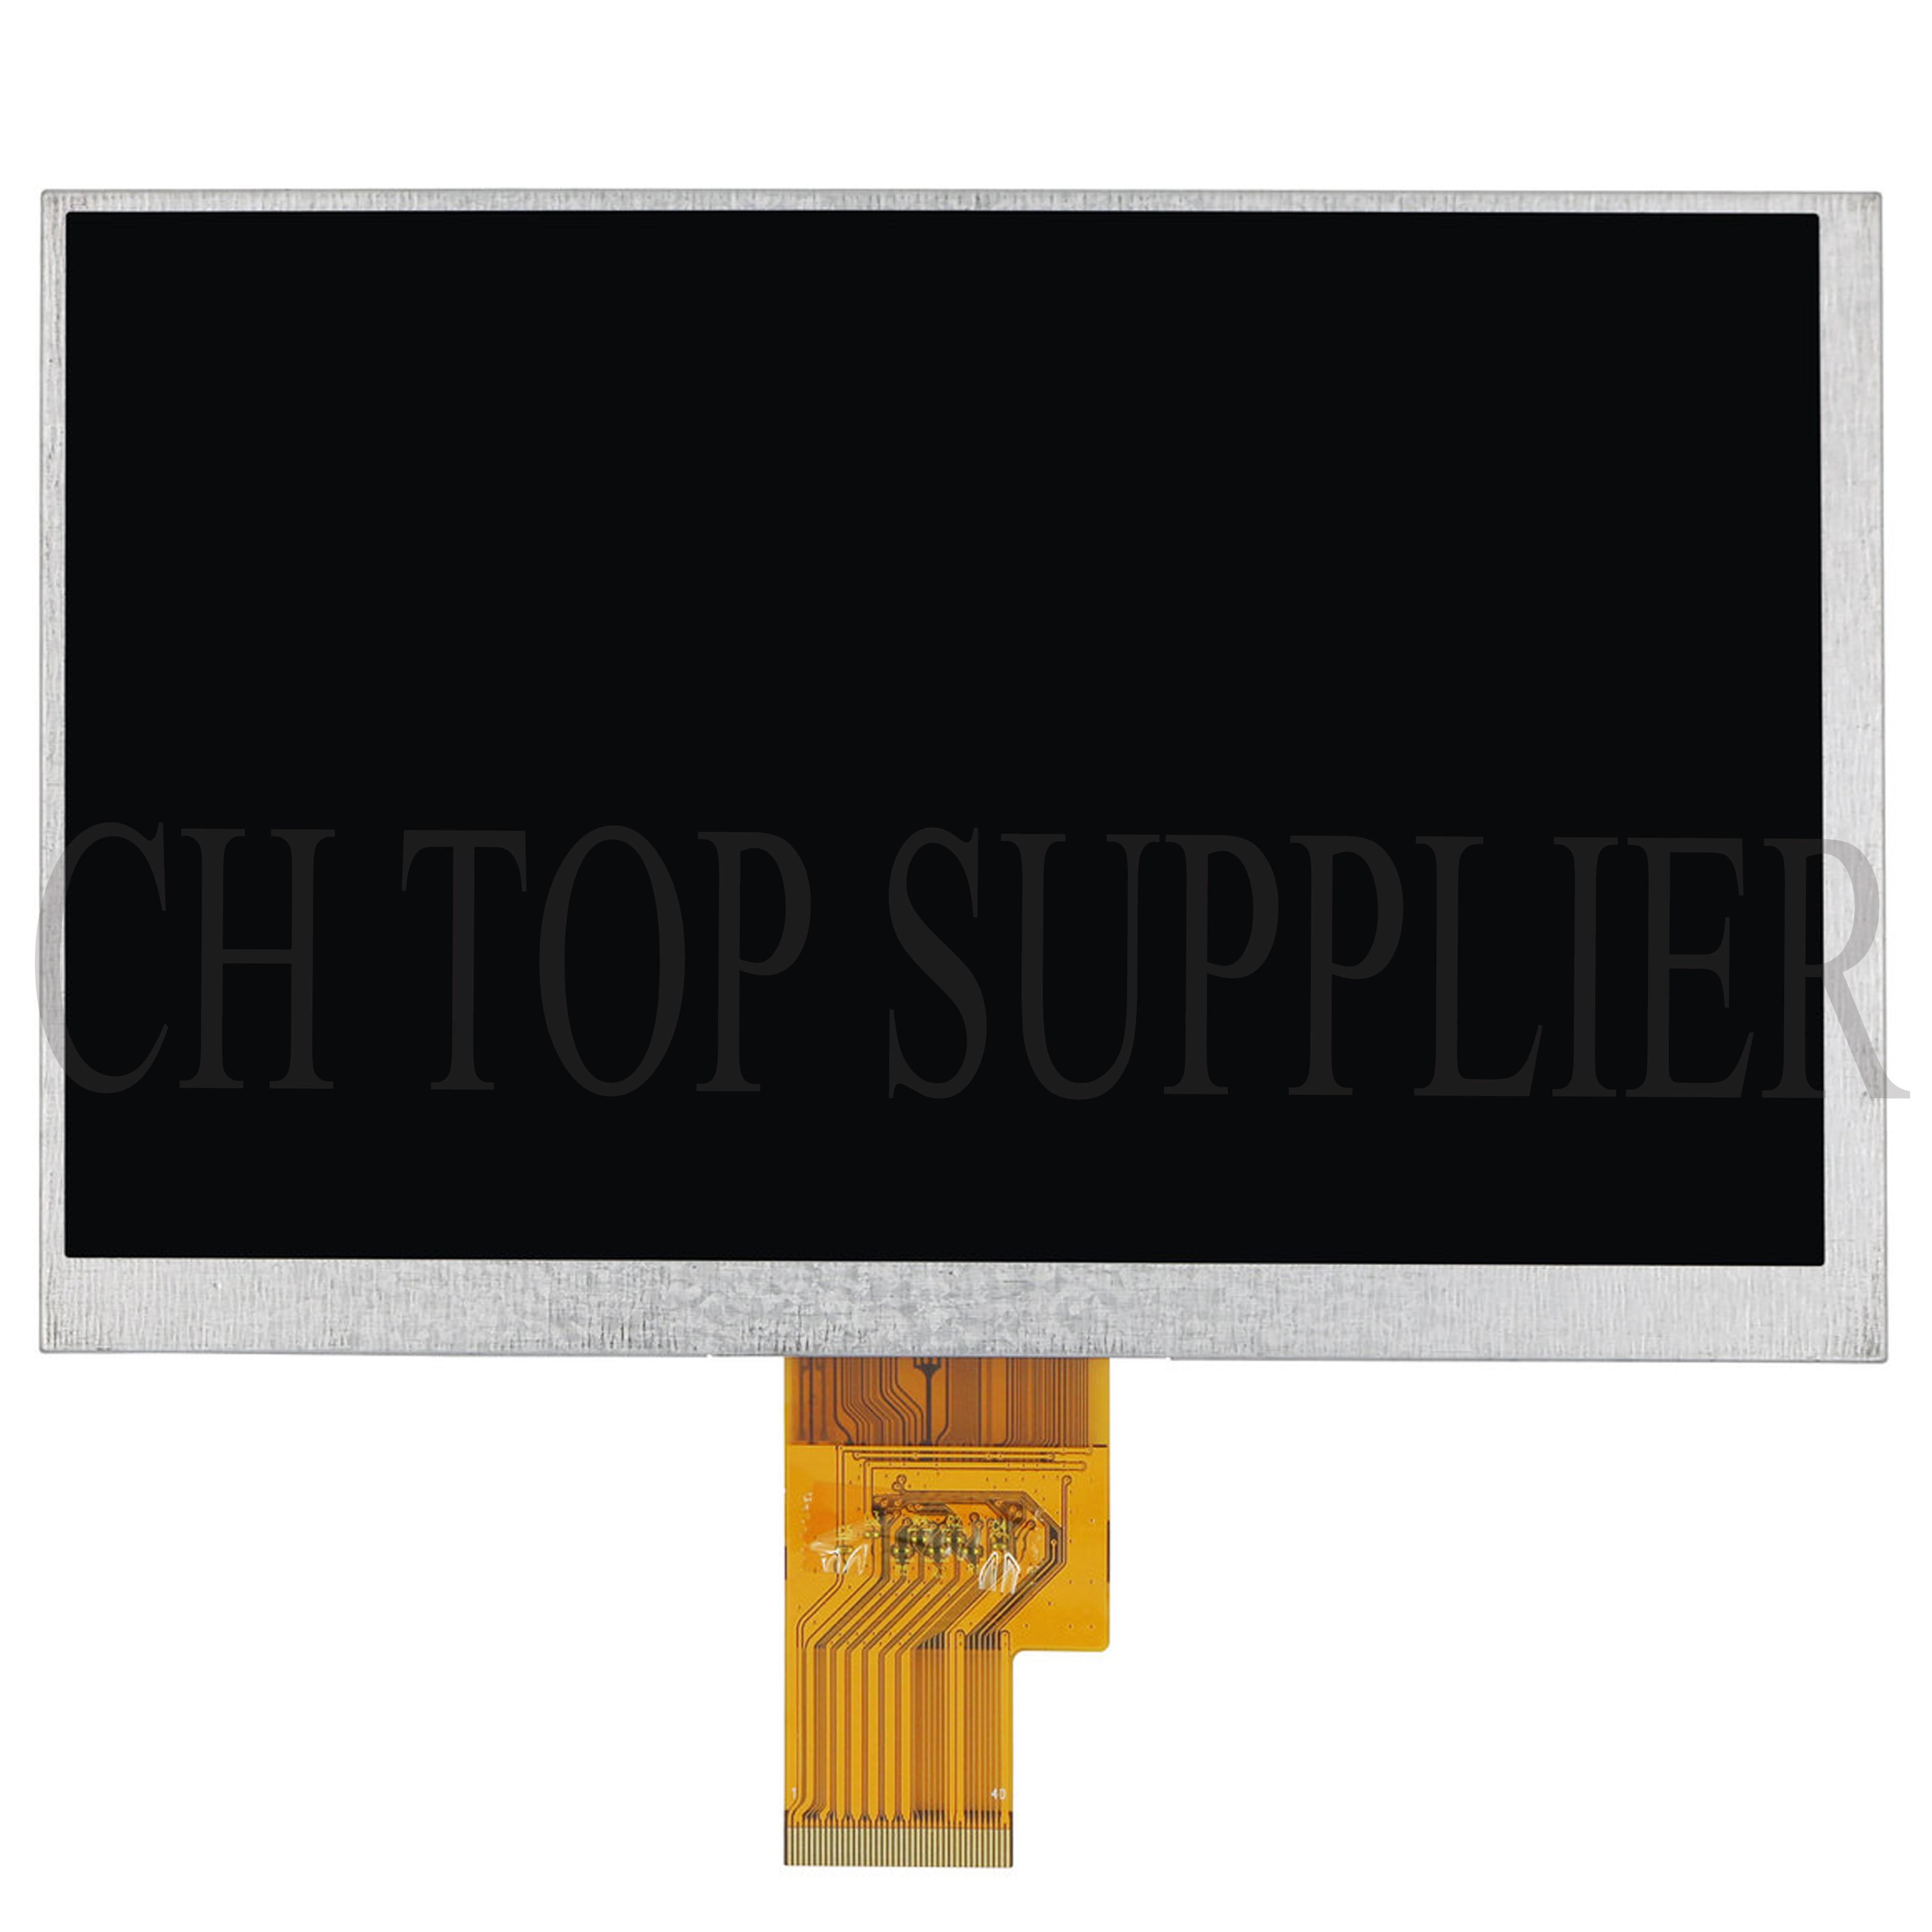 LCD Display Screen Panel Replacement 7 inch TABLET TXDT700SPL-28 6150a28 1024*600 Digita ...